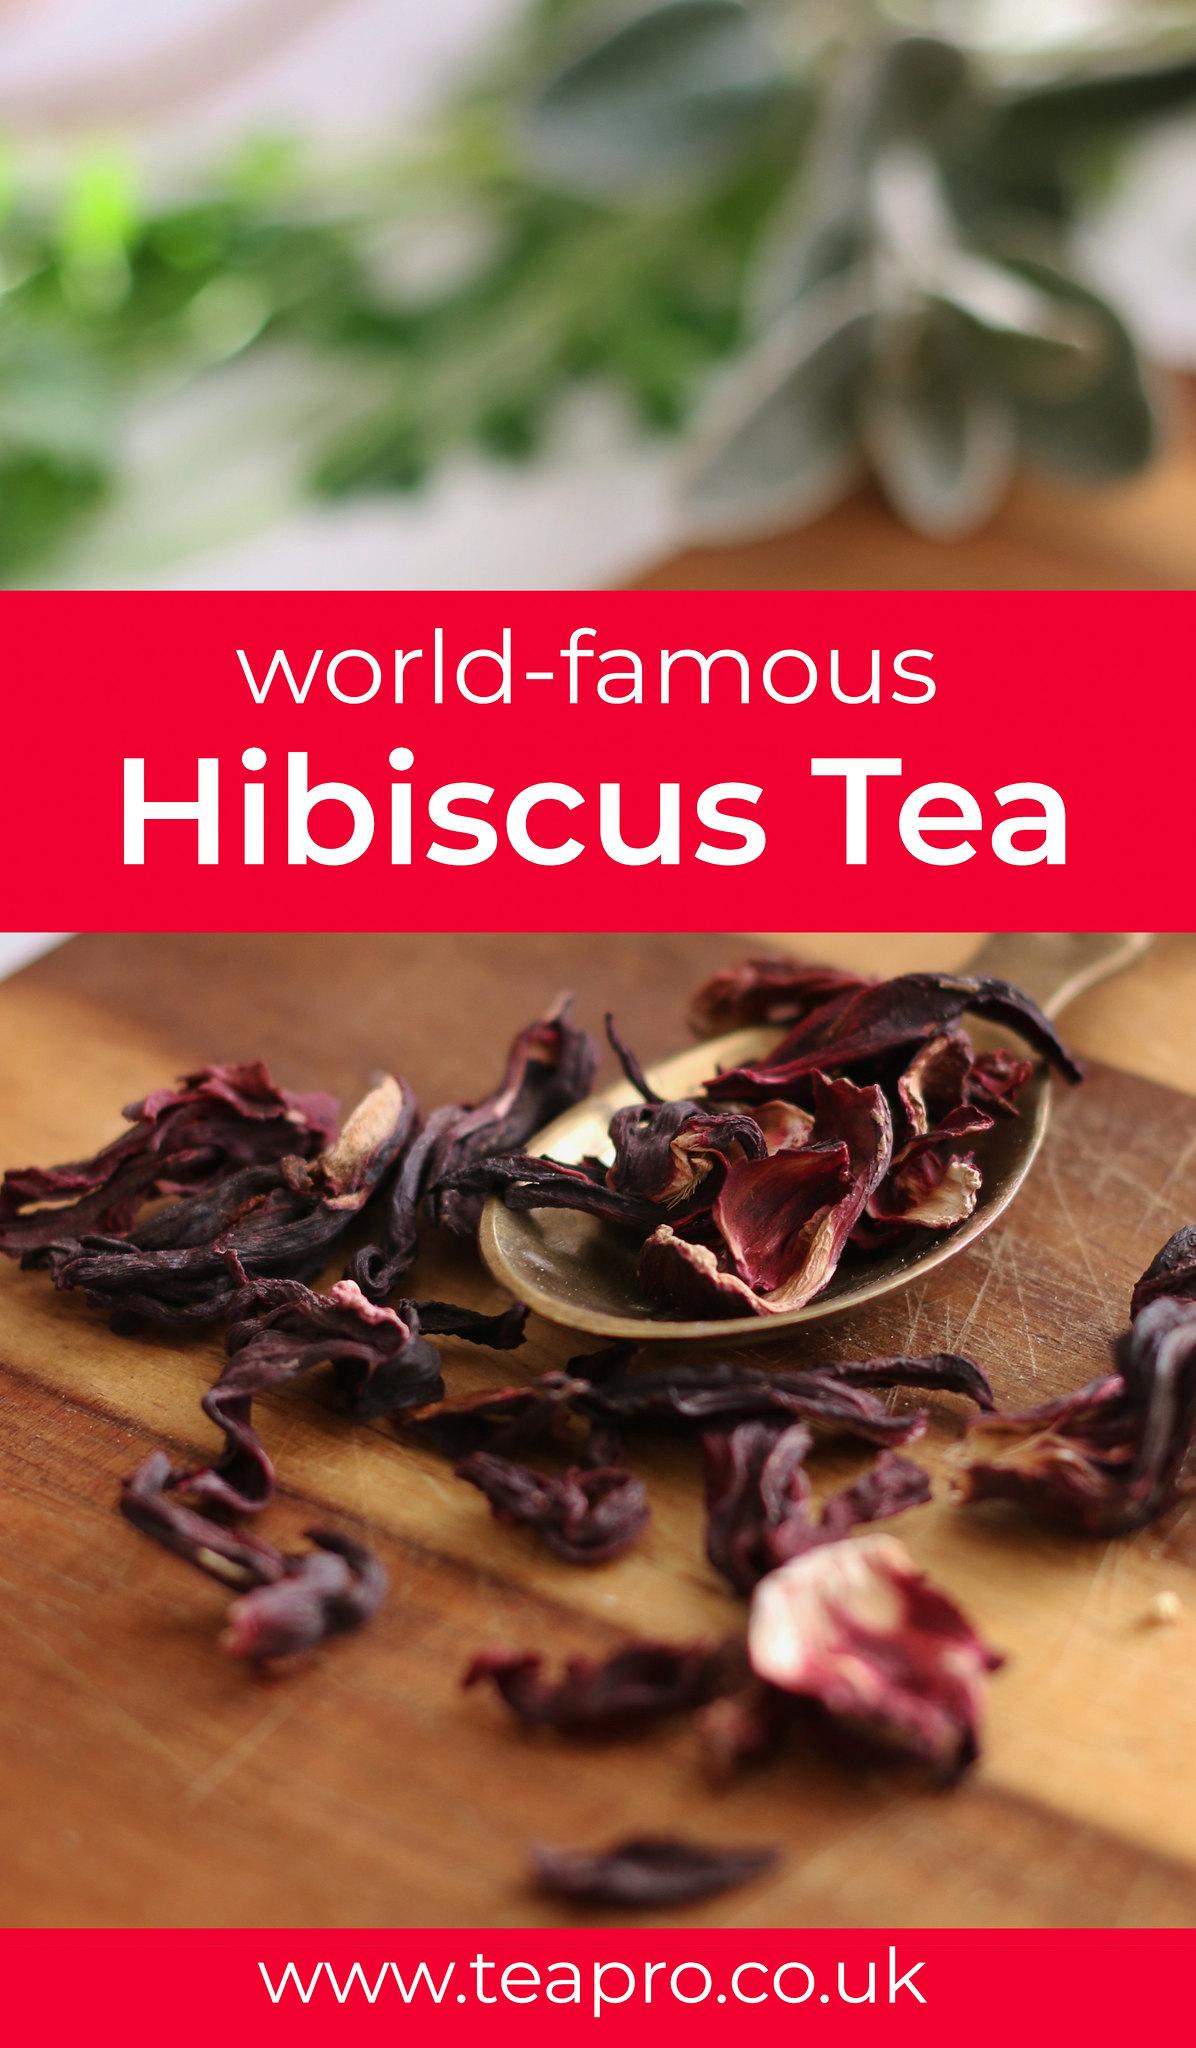 world-famous-hibiscus-tea